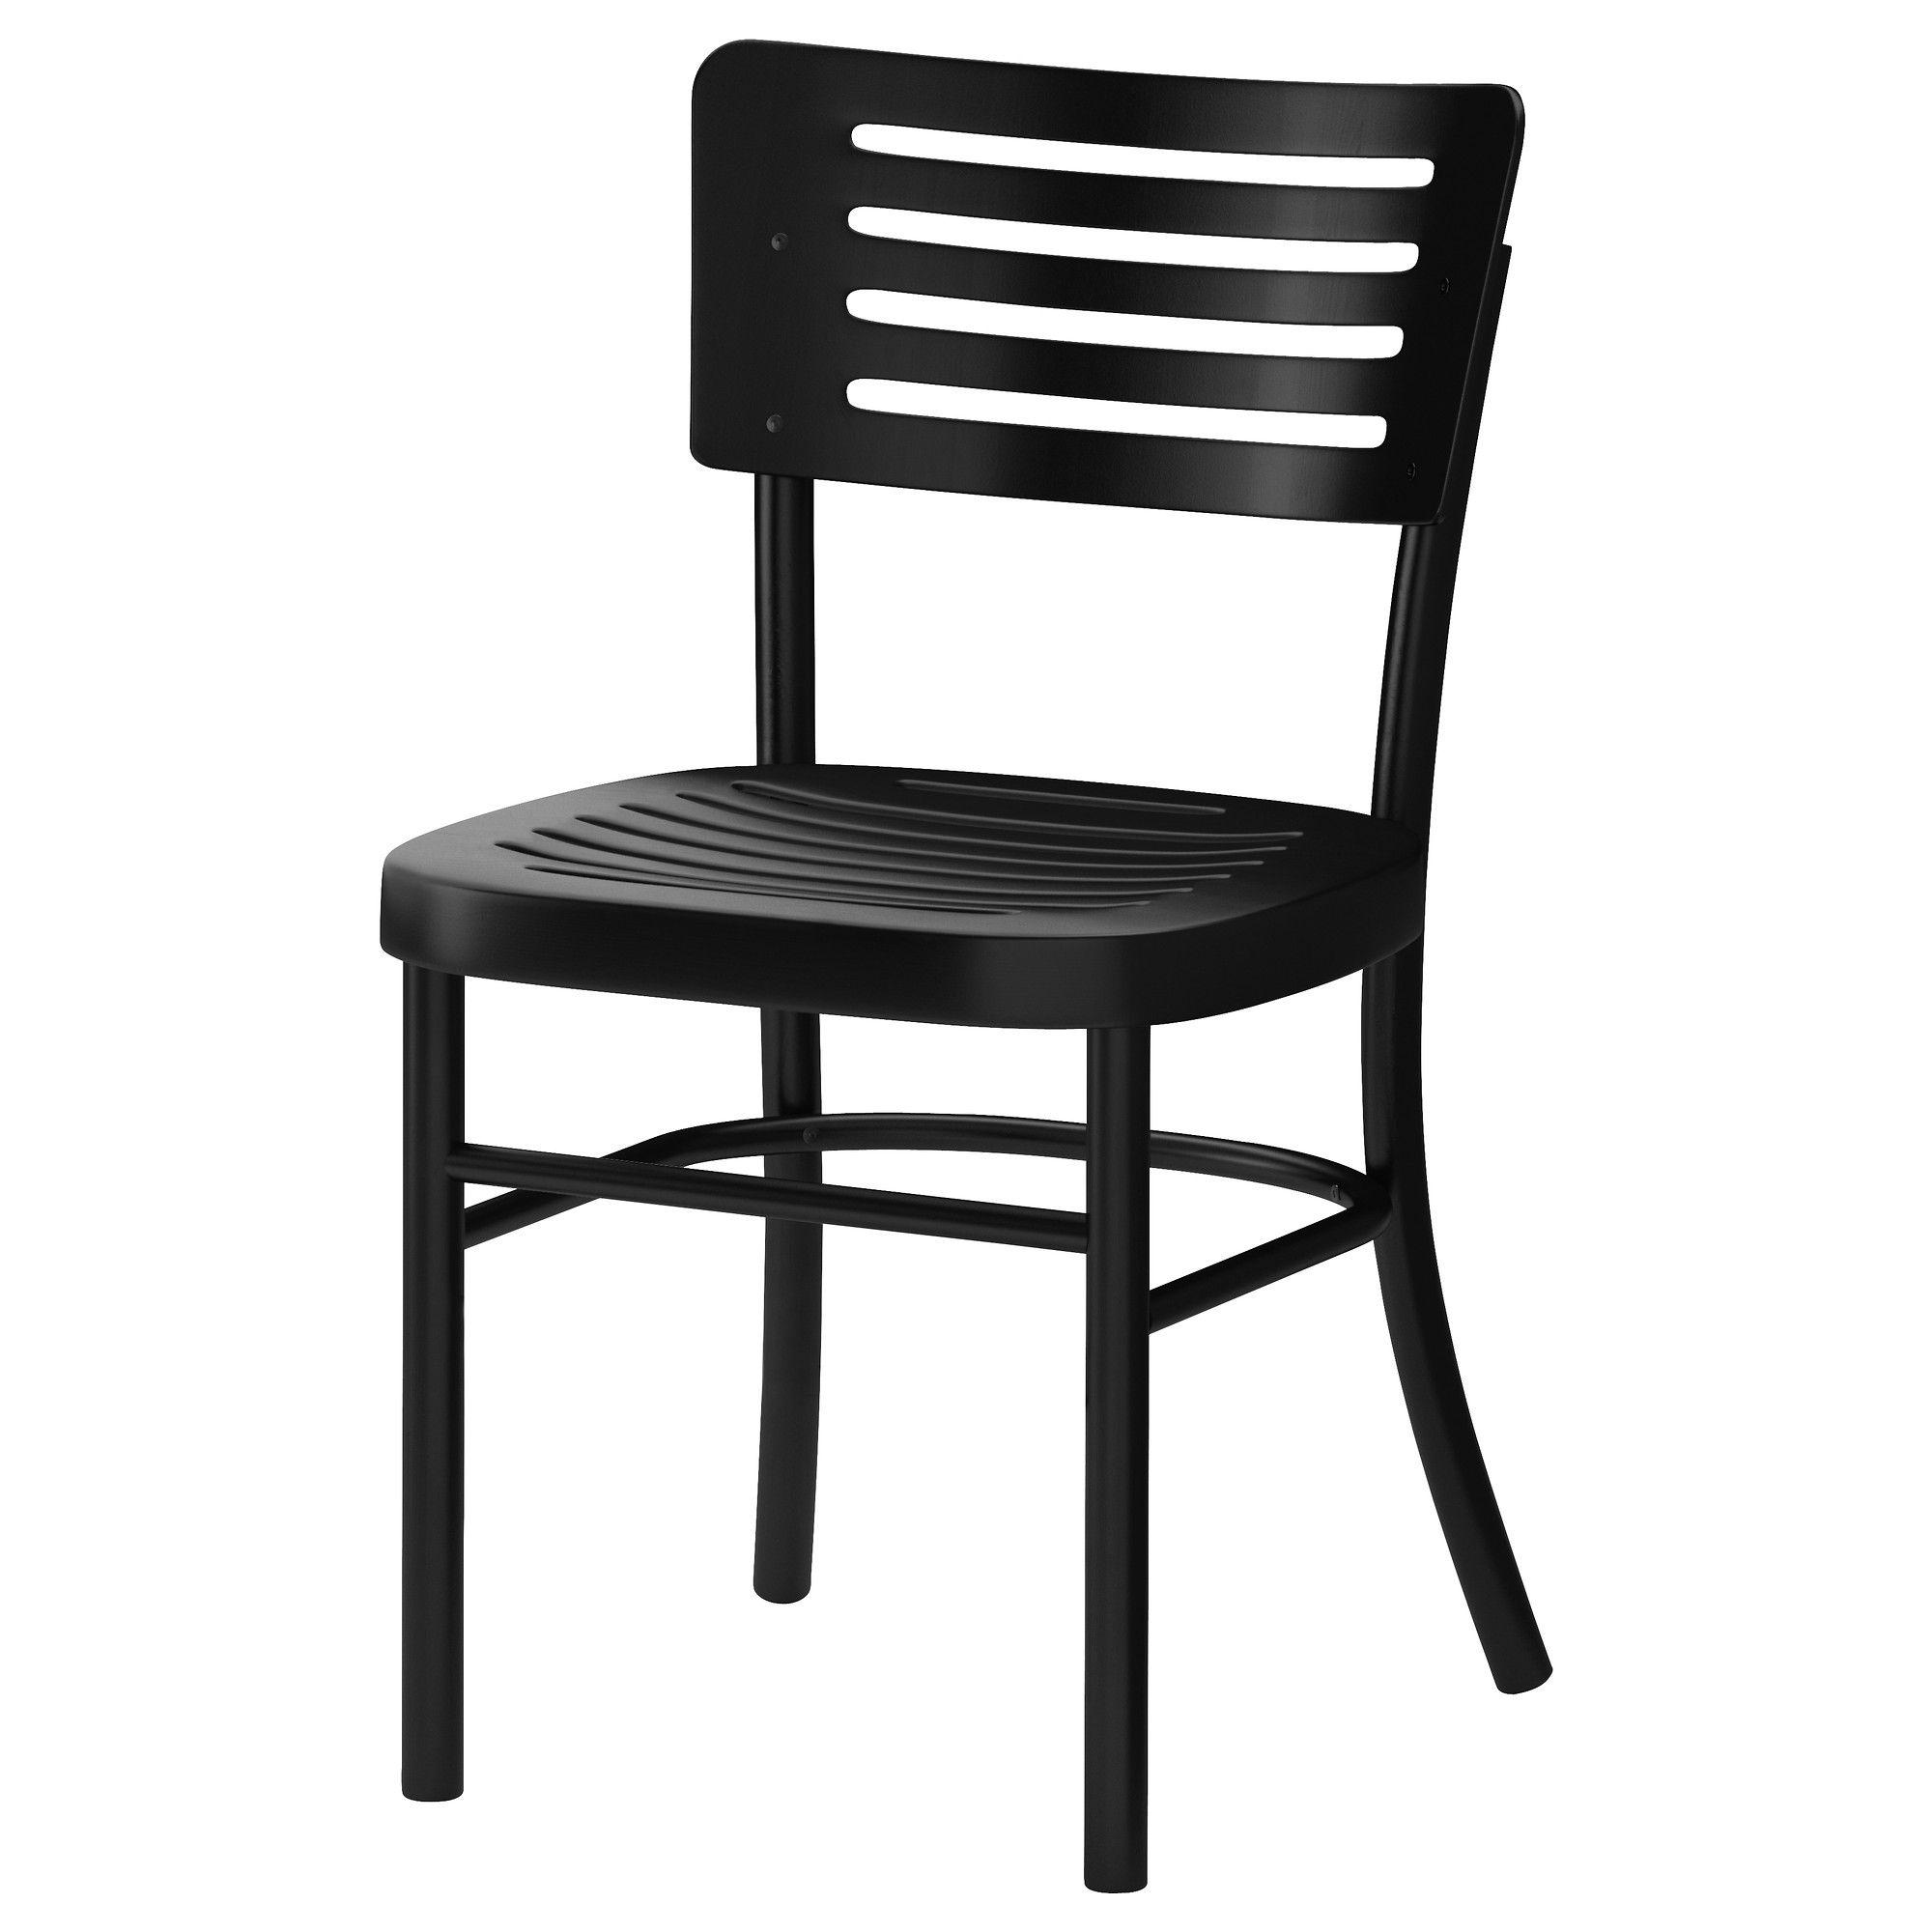 BALSER Chair black IKEA Digital Gym CINEMA